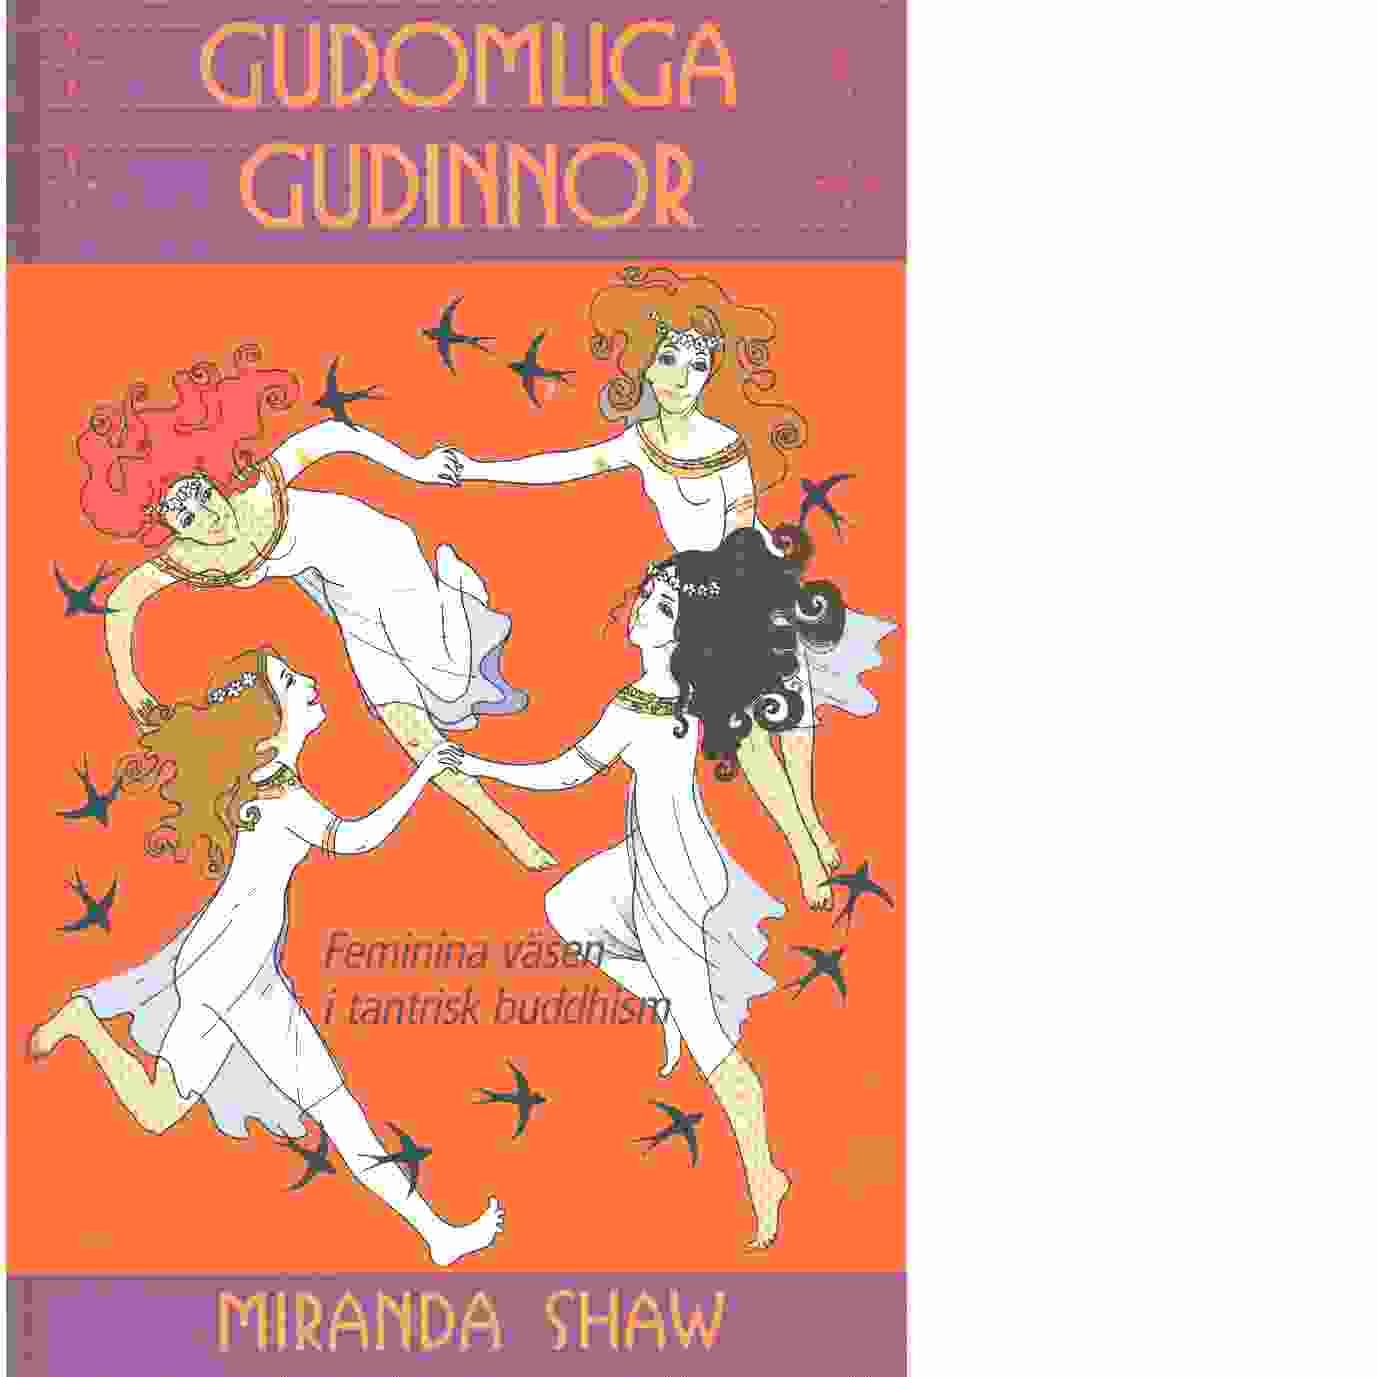 Gudomliga gudinnor : feminina väsen i tantrisk buddhism - Shaw, Miranda